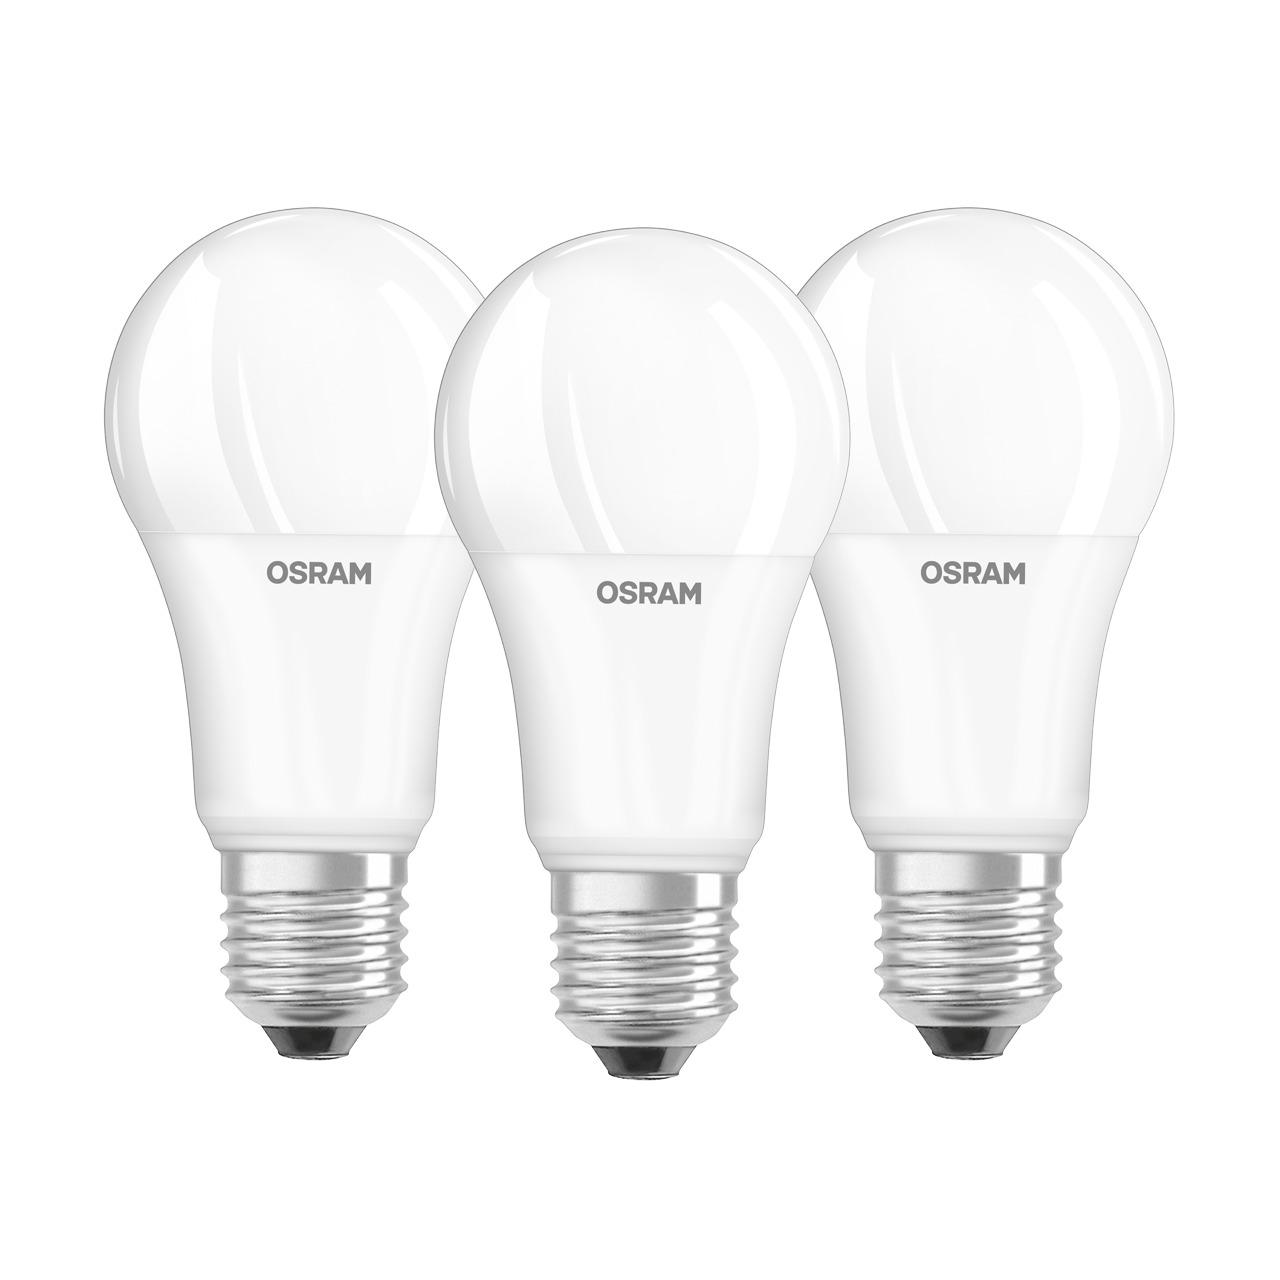 OSRAM LED PROMO 3er Set 14-W-Filament-LED-Lampe E27- warmweiss- matt